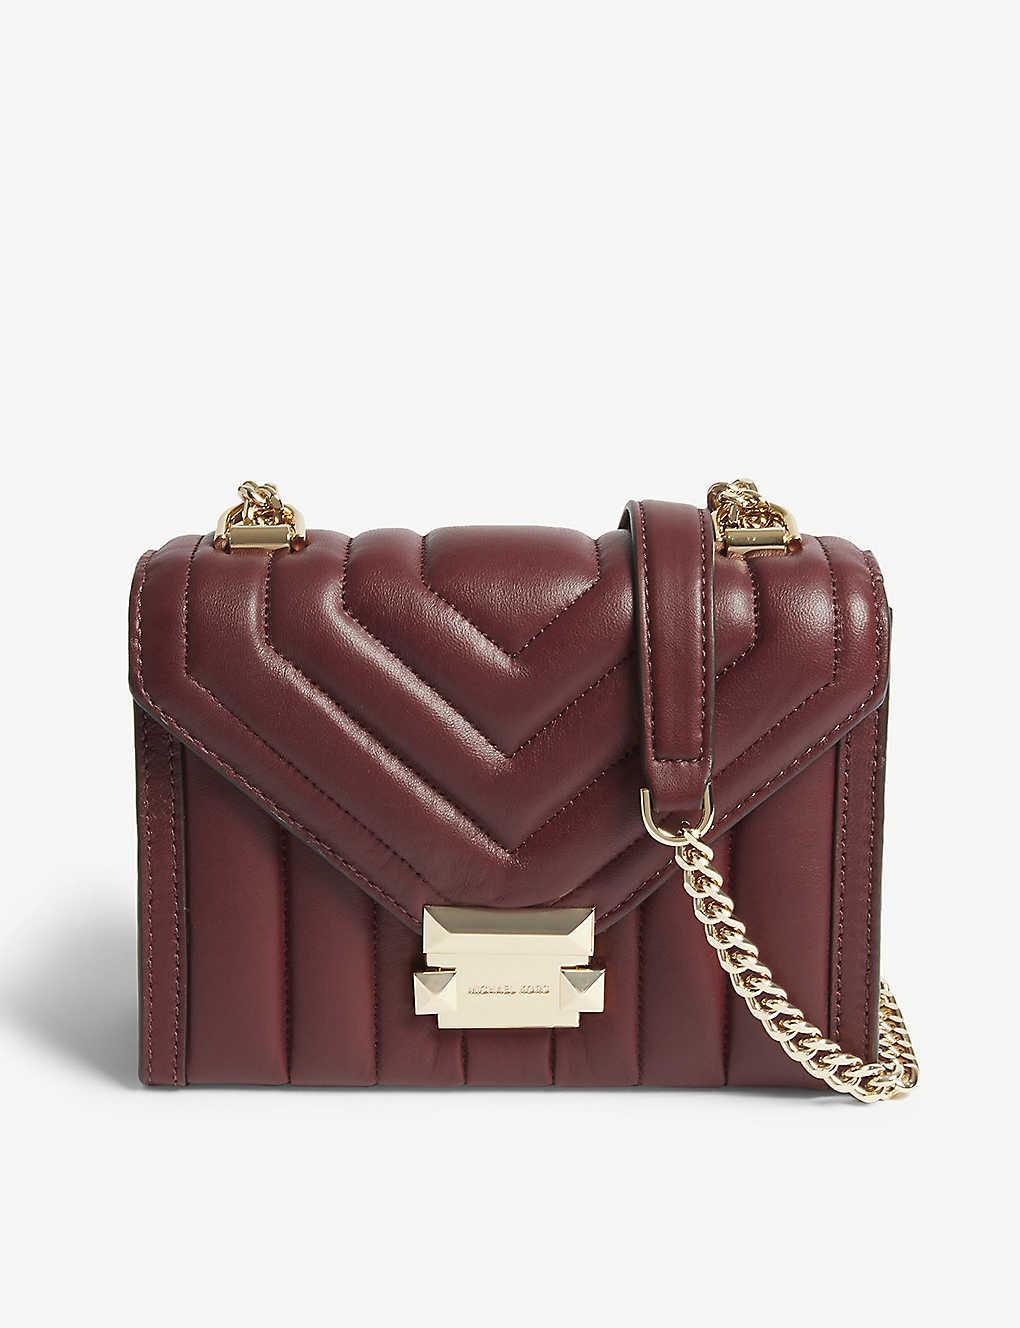 2373e47f1705fa MICHAEL MICHAEL KORS - Whitney small leather shoulder bag ...